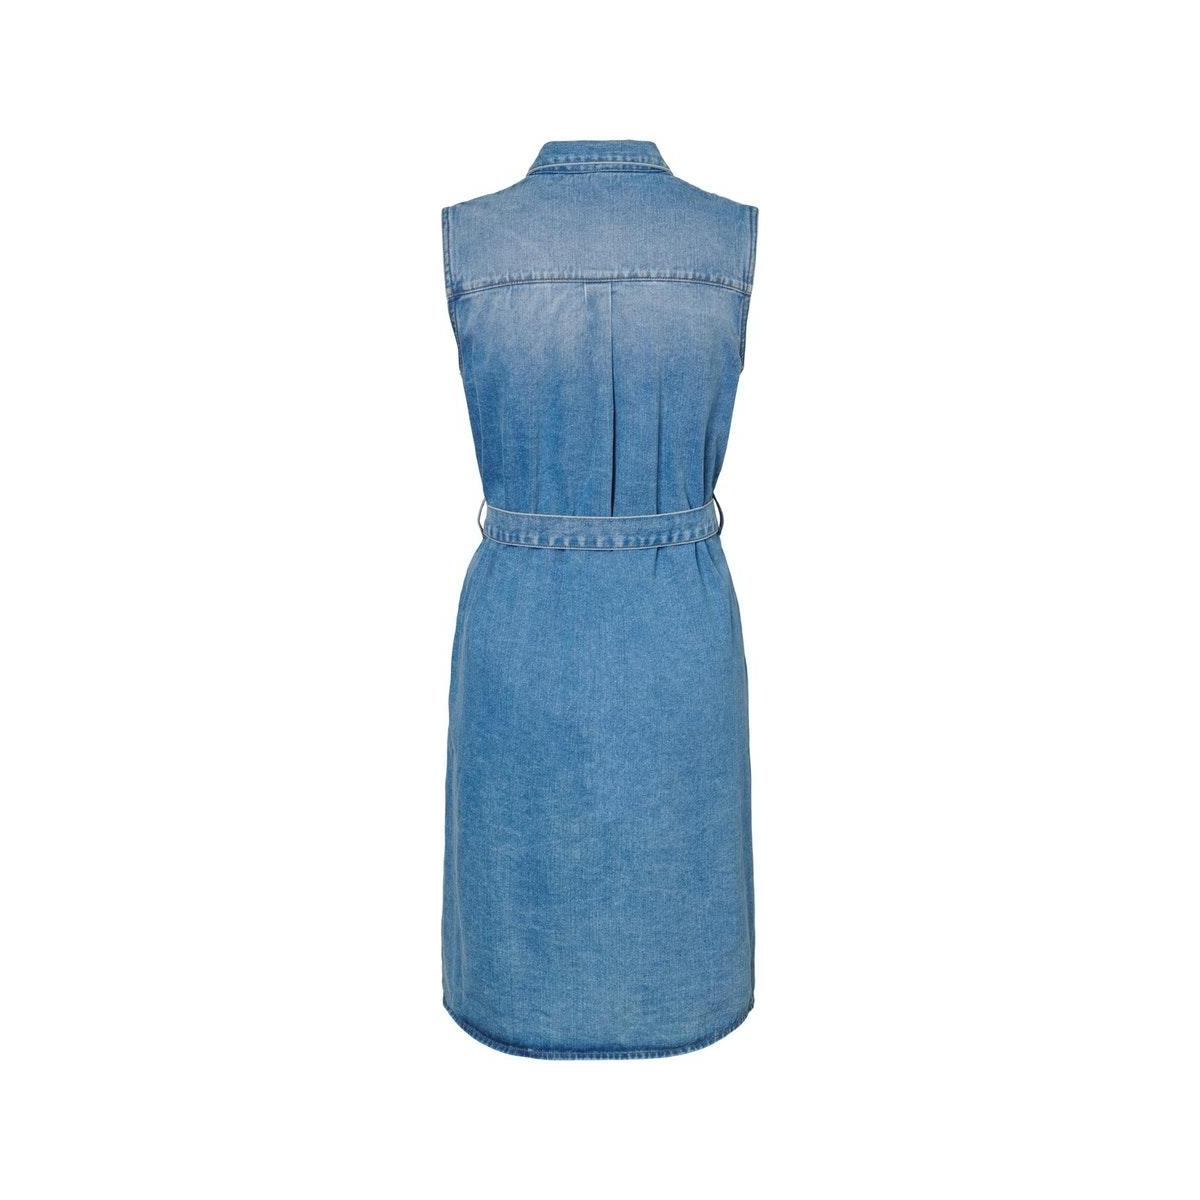 nmmina s/l button dnm dress tz024mb 27011448 noisy may jurk medium blue denim